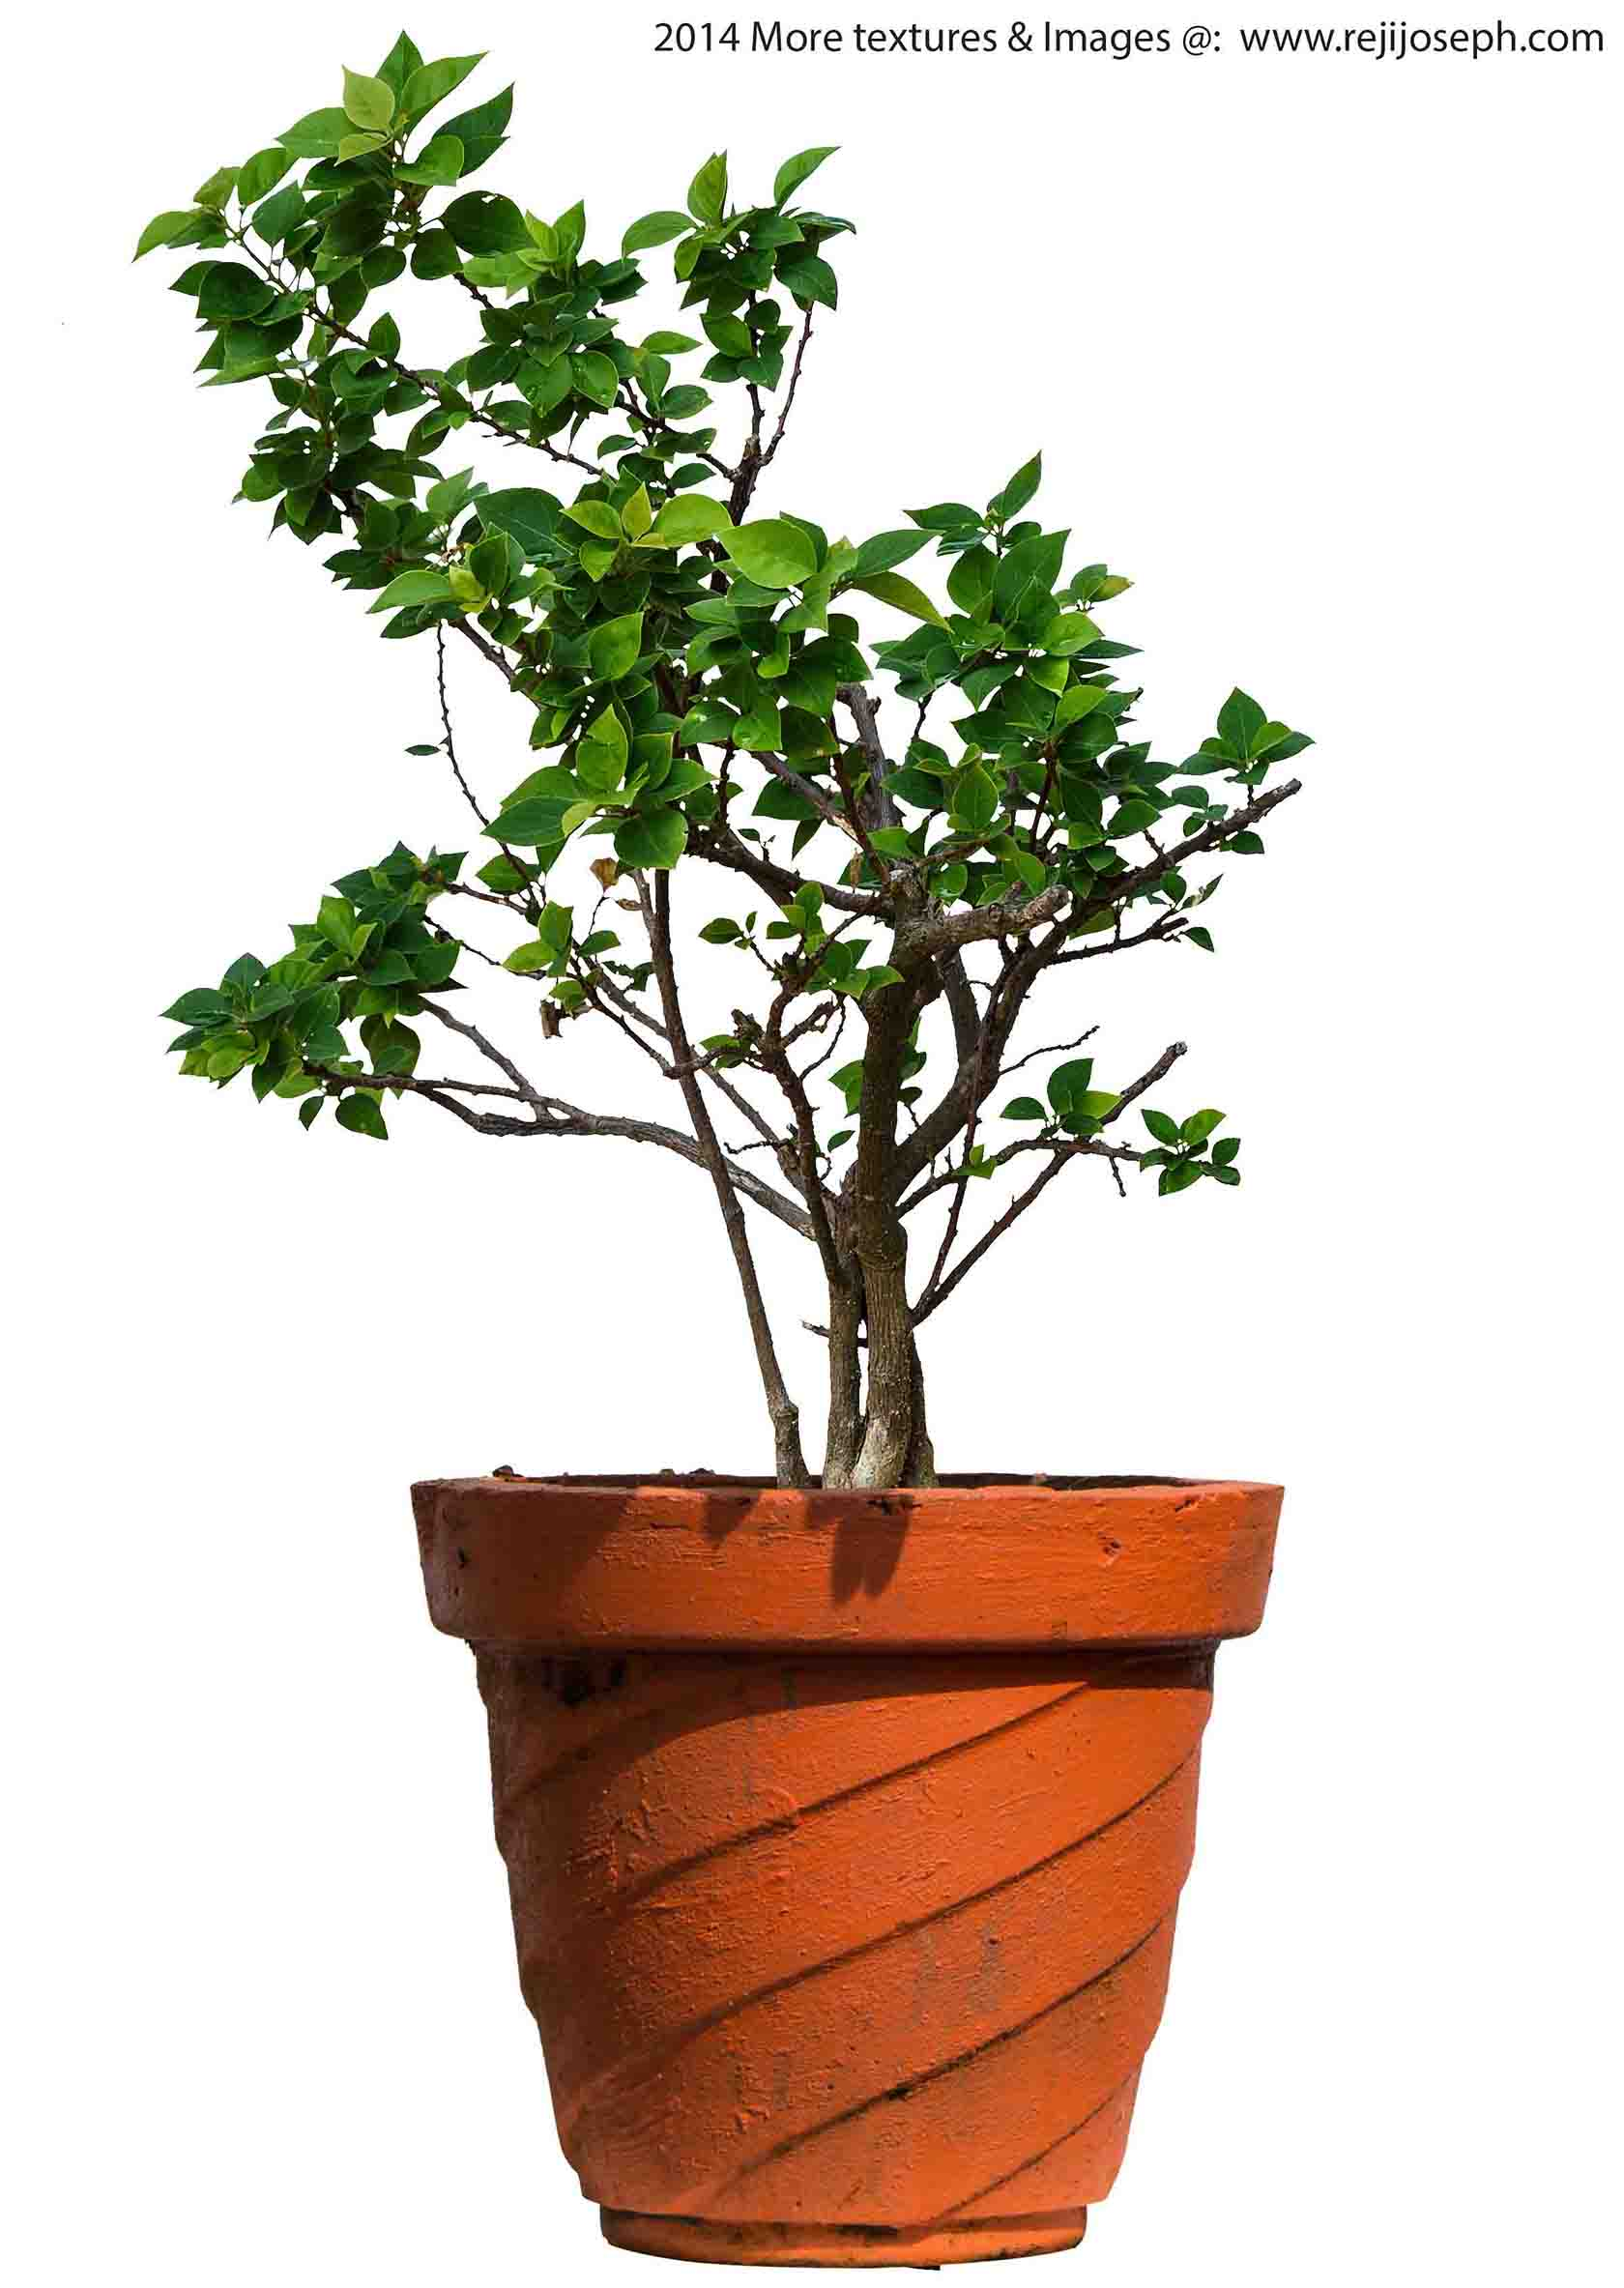 Bougainvillea Garden Plant Texture 00005